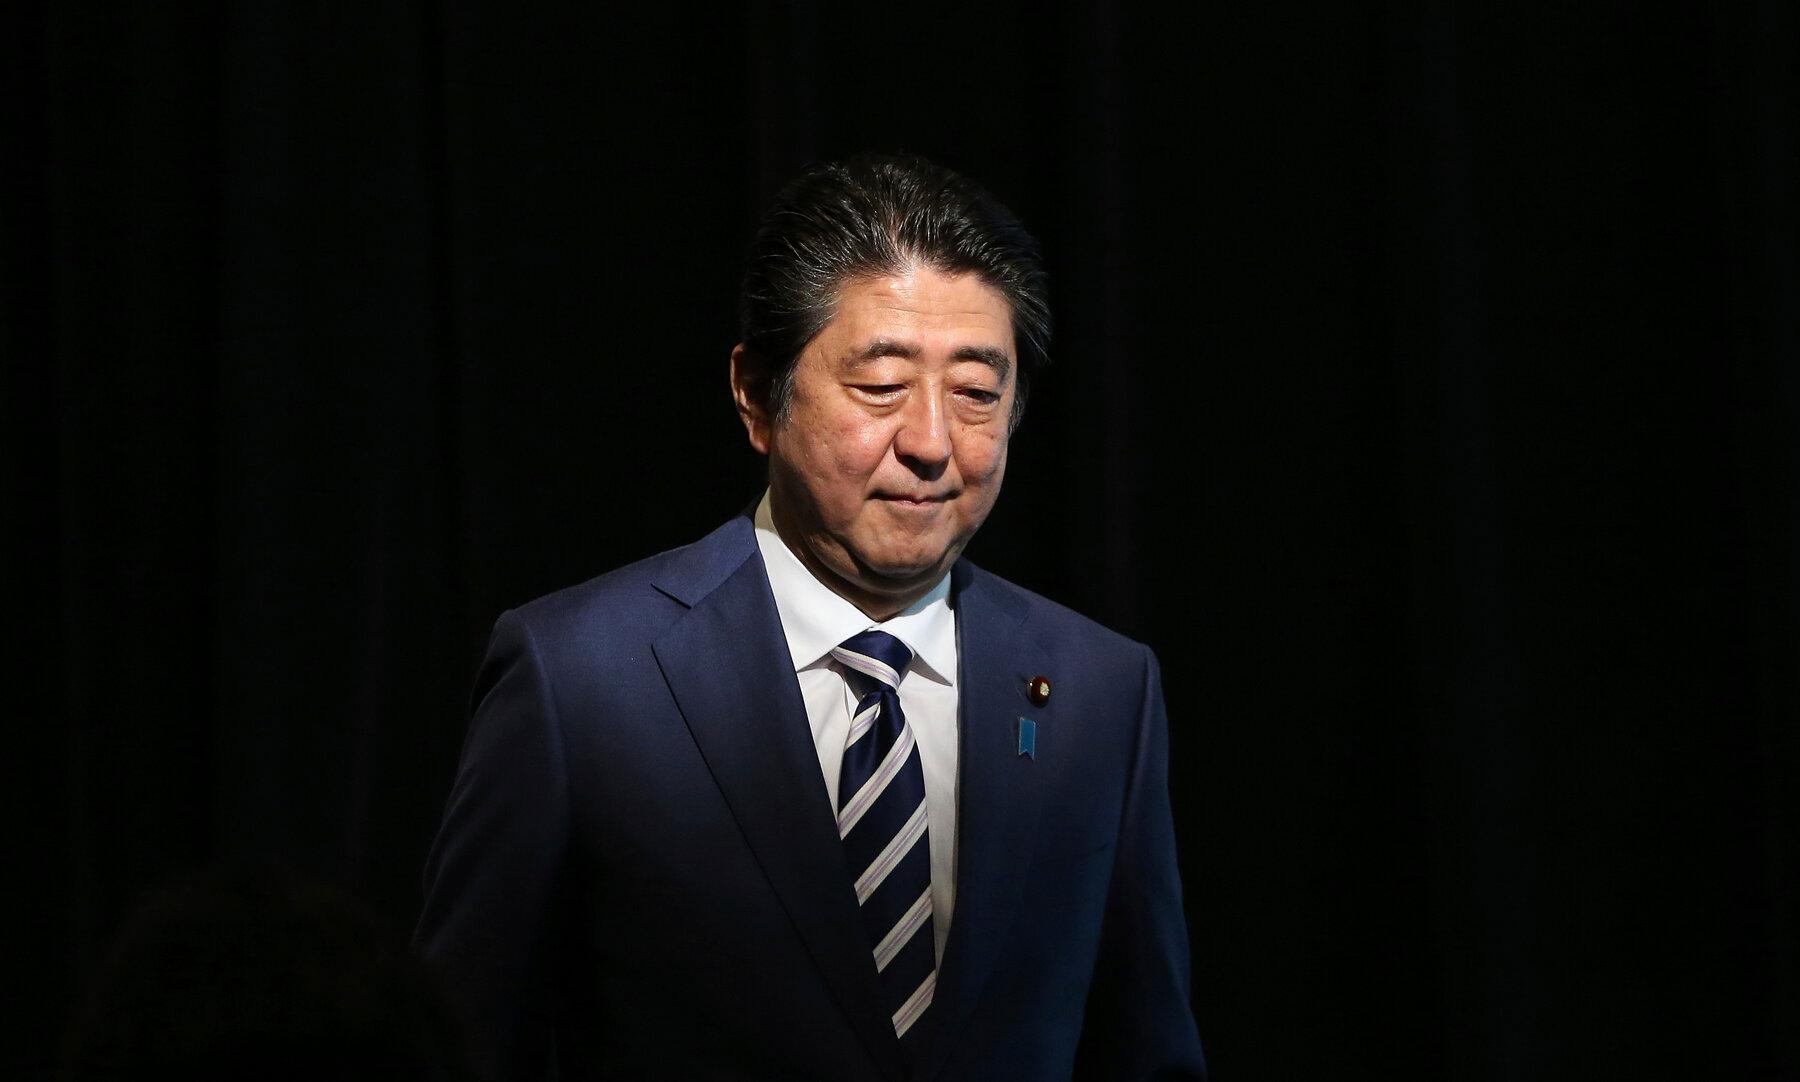 Shinzo Abe, Japan's longest-serving leader, will resign because of illness